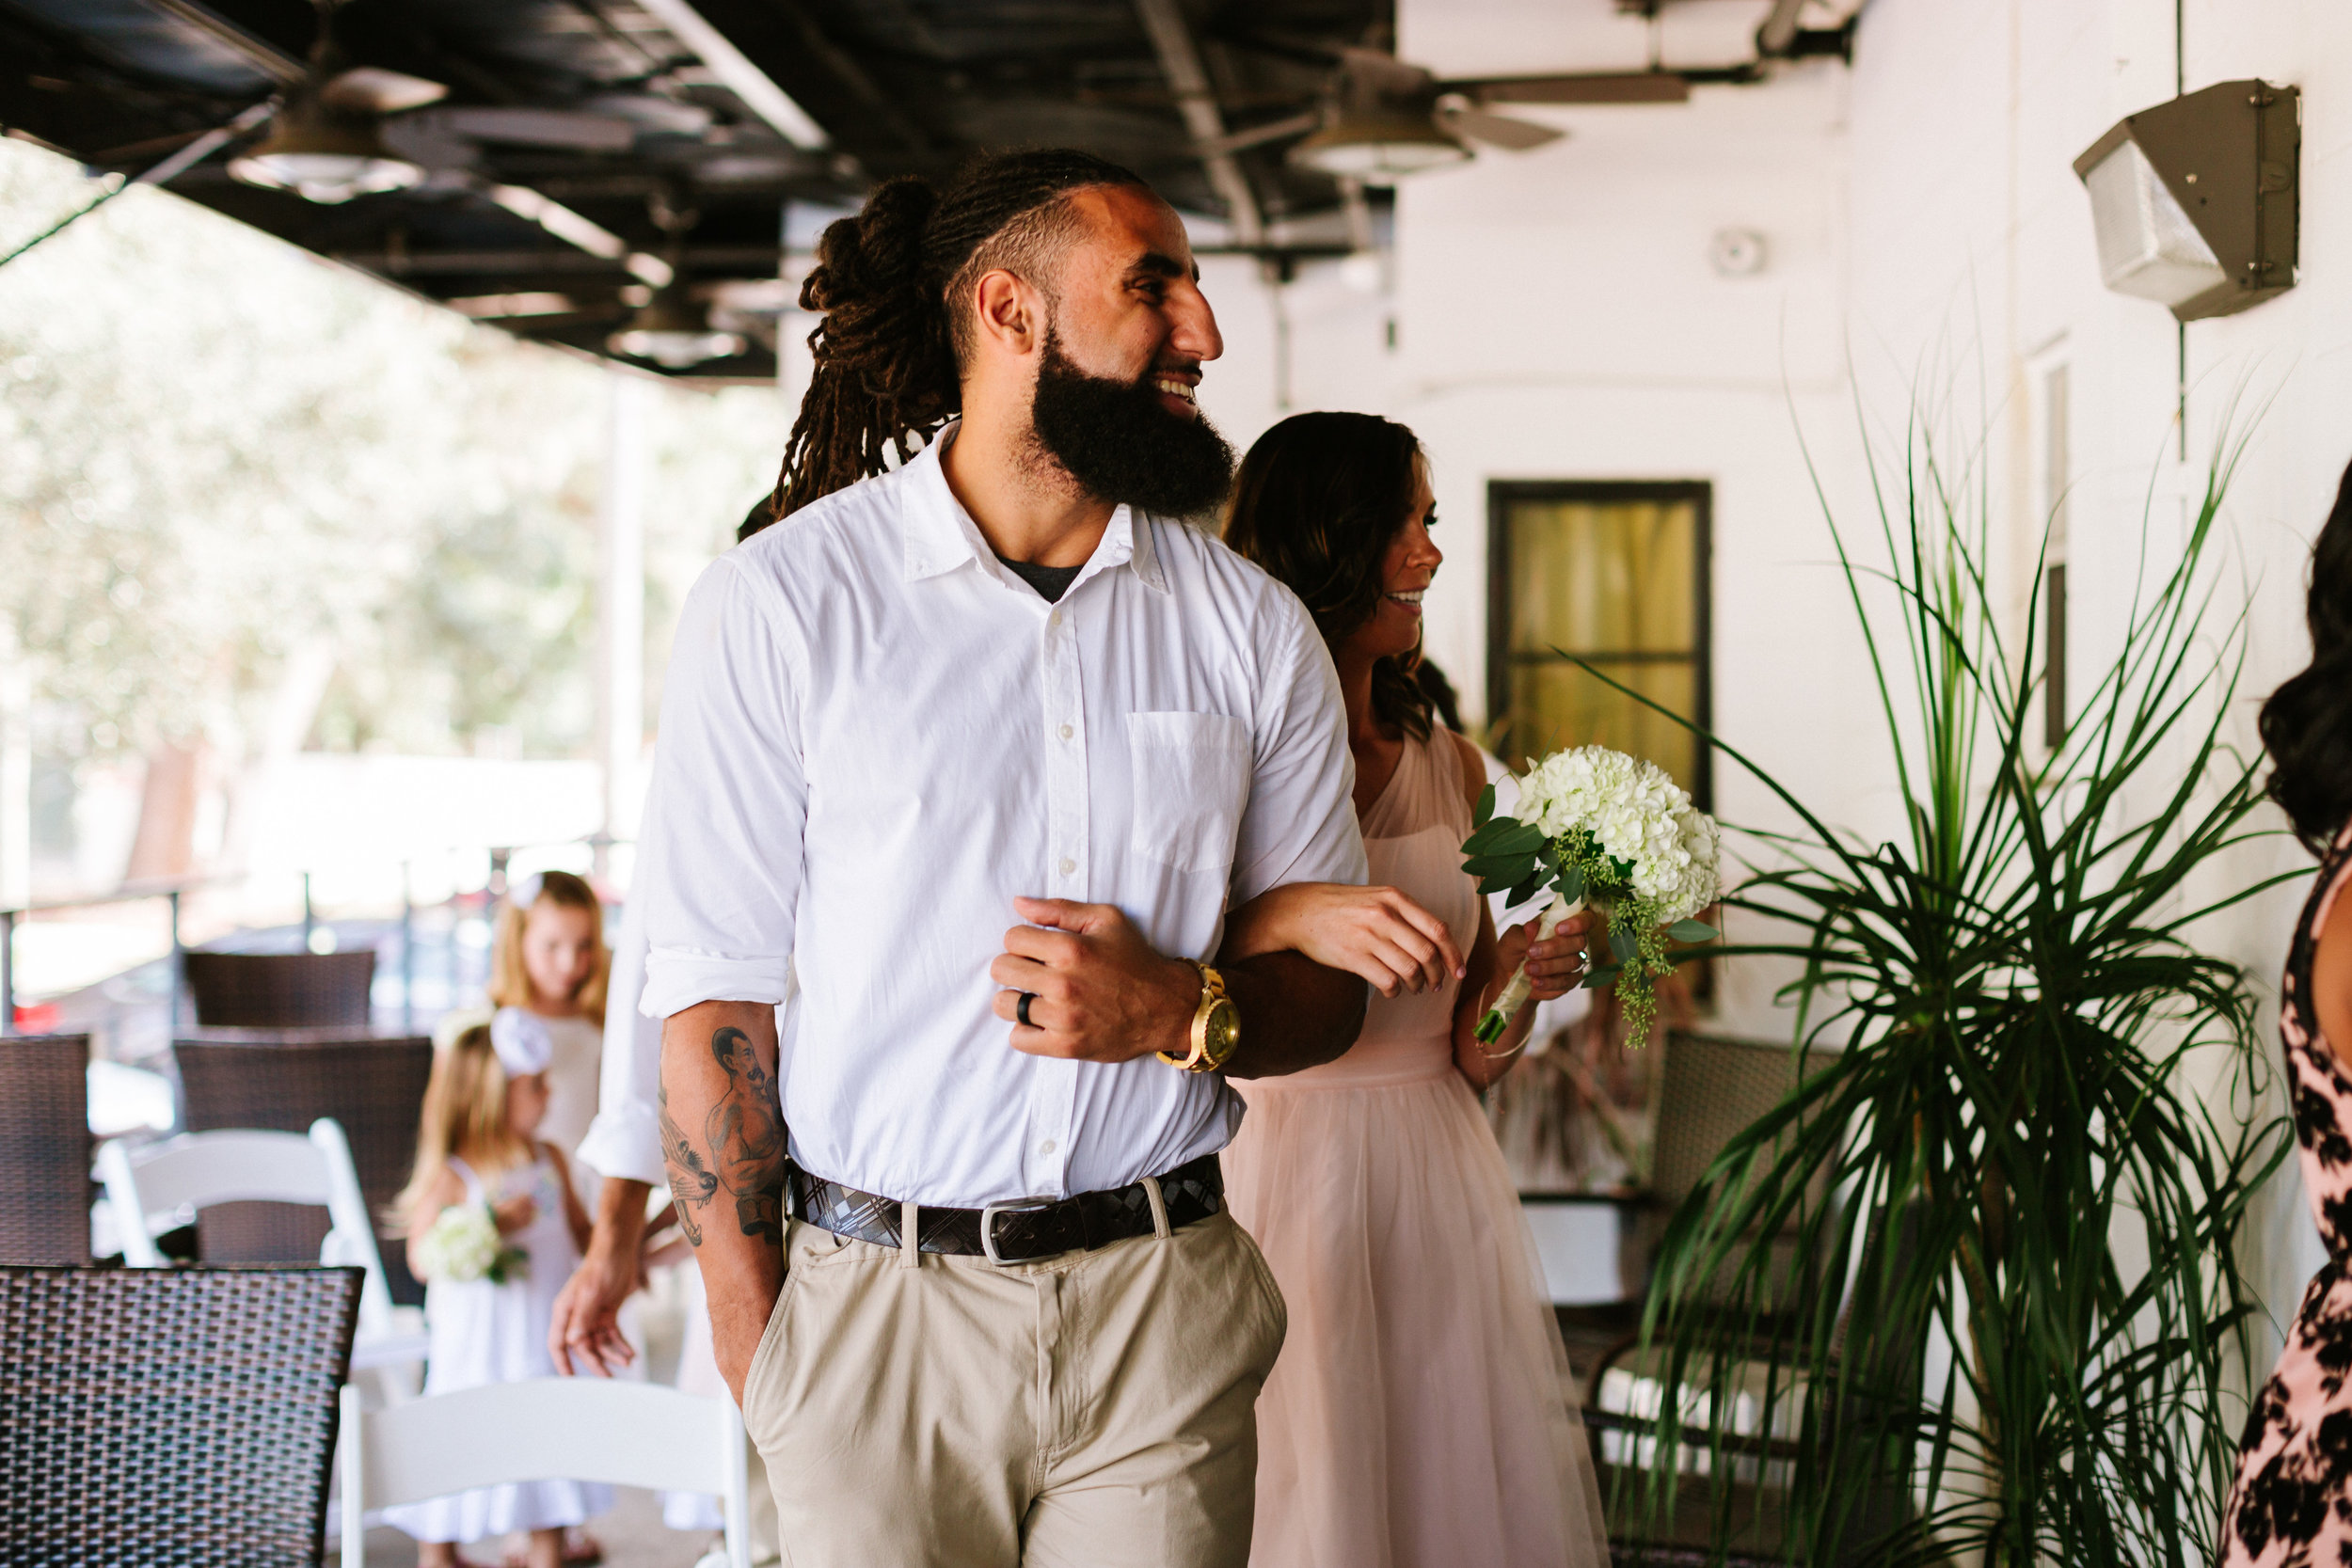 2017.09.16 Ashley and Chuck O'Day Quantam Leap Winery Wedding (112 of 462).jpg